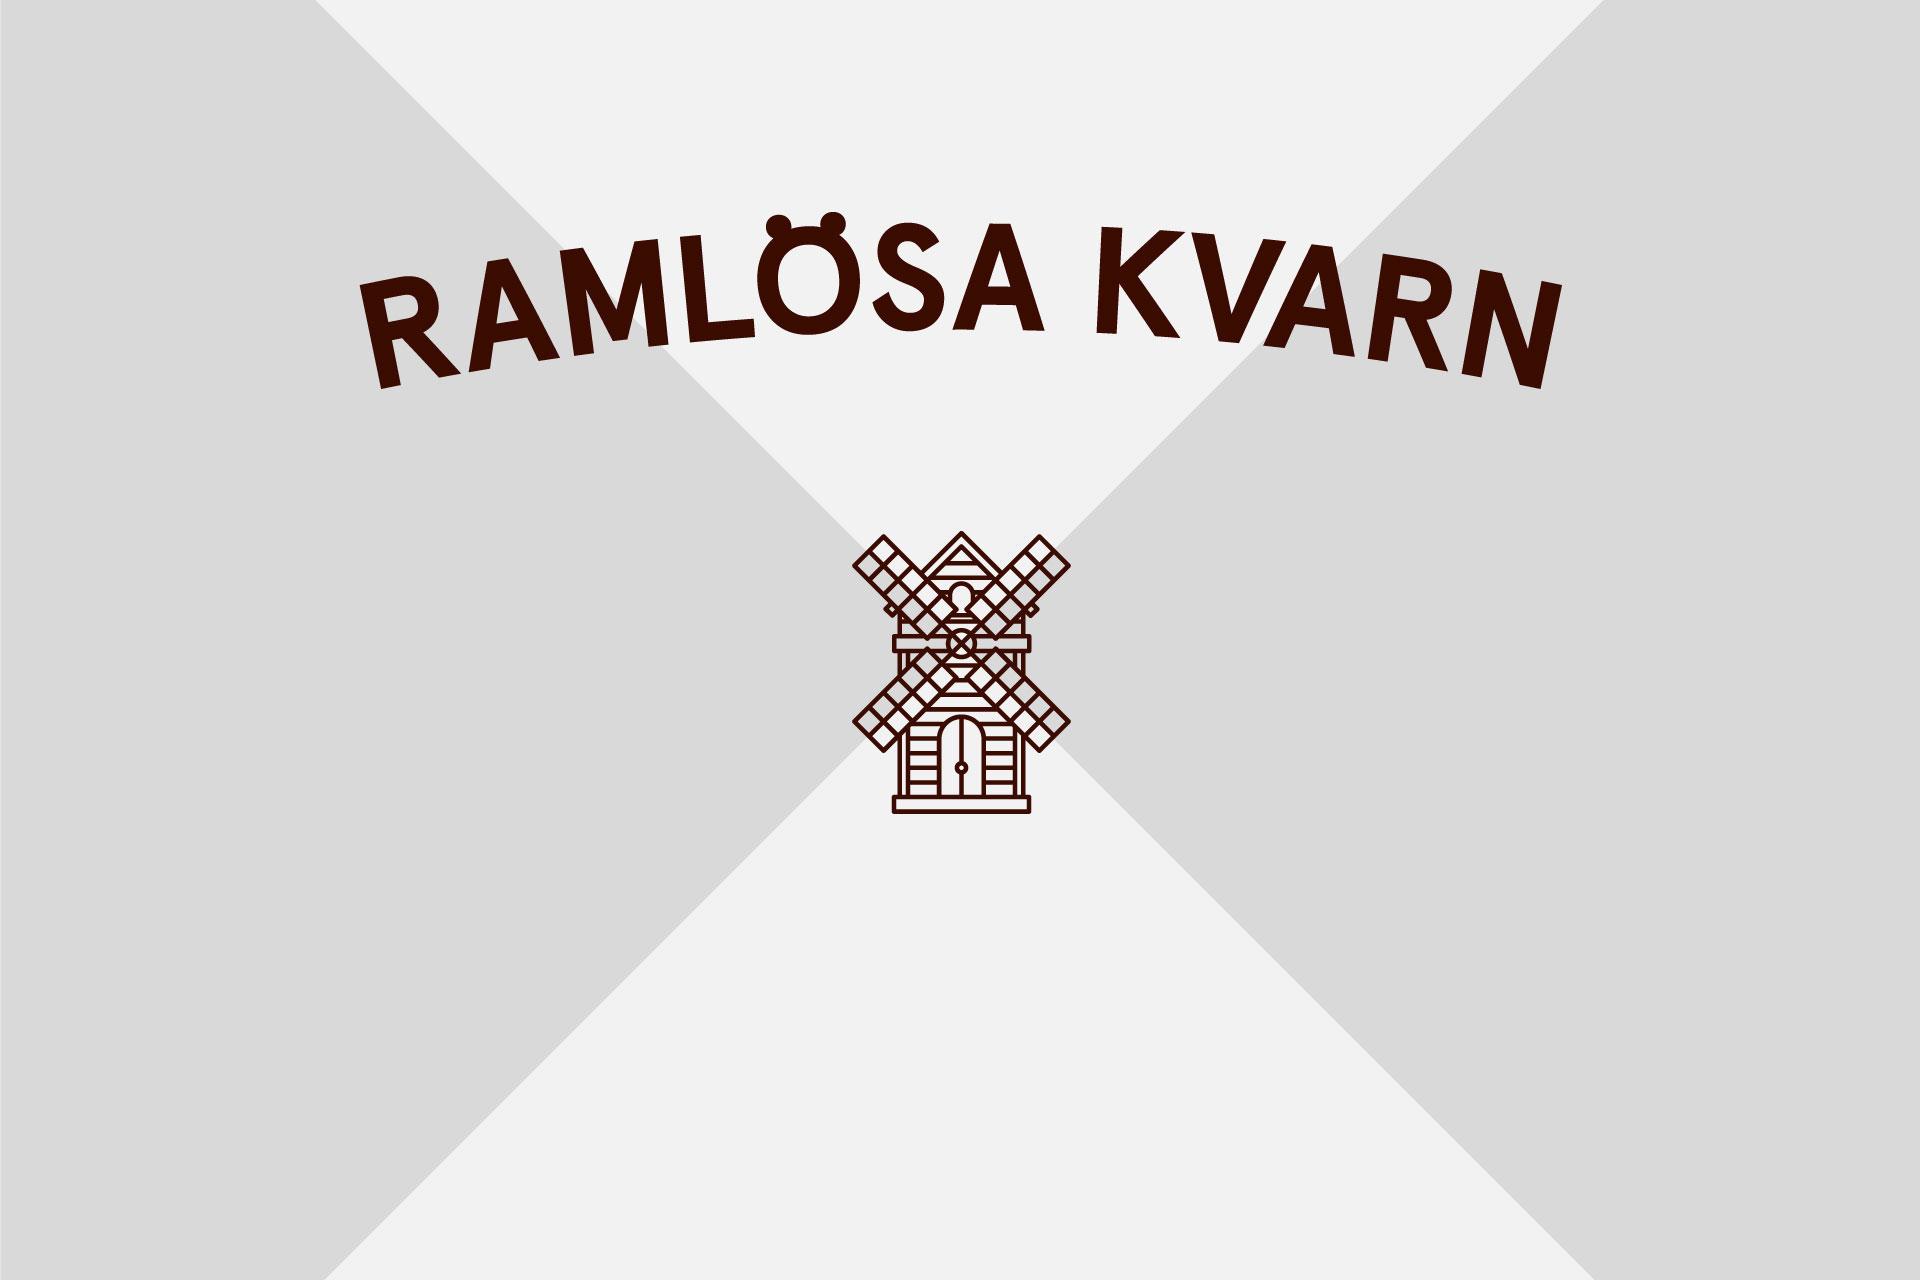 Amore's new logo for Ramlösa Kvarn. Image courtesy of Amore.